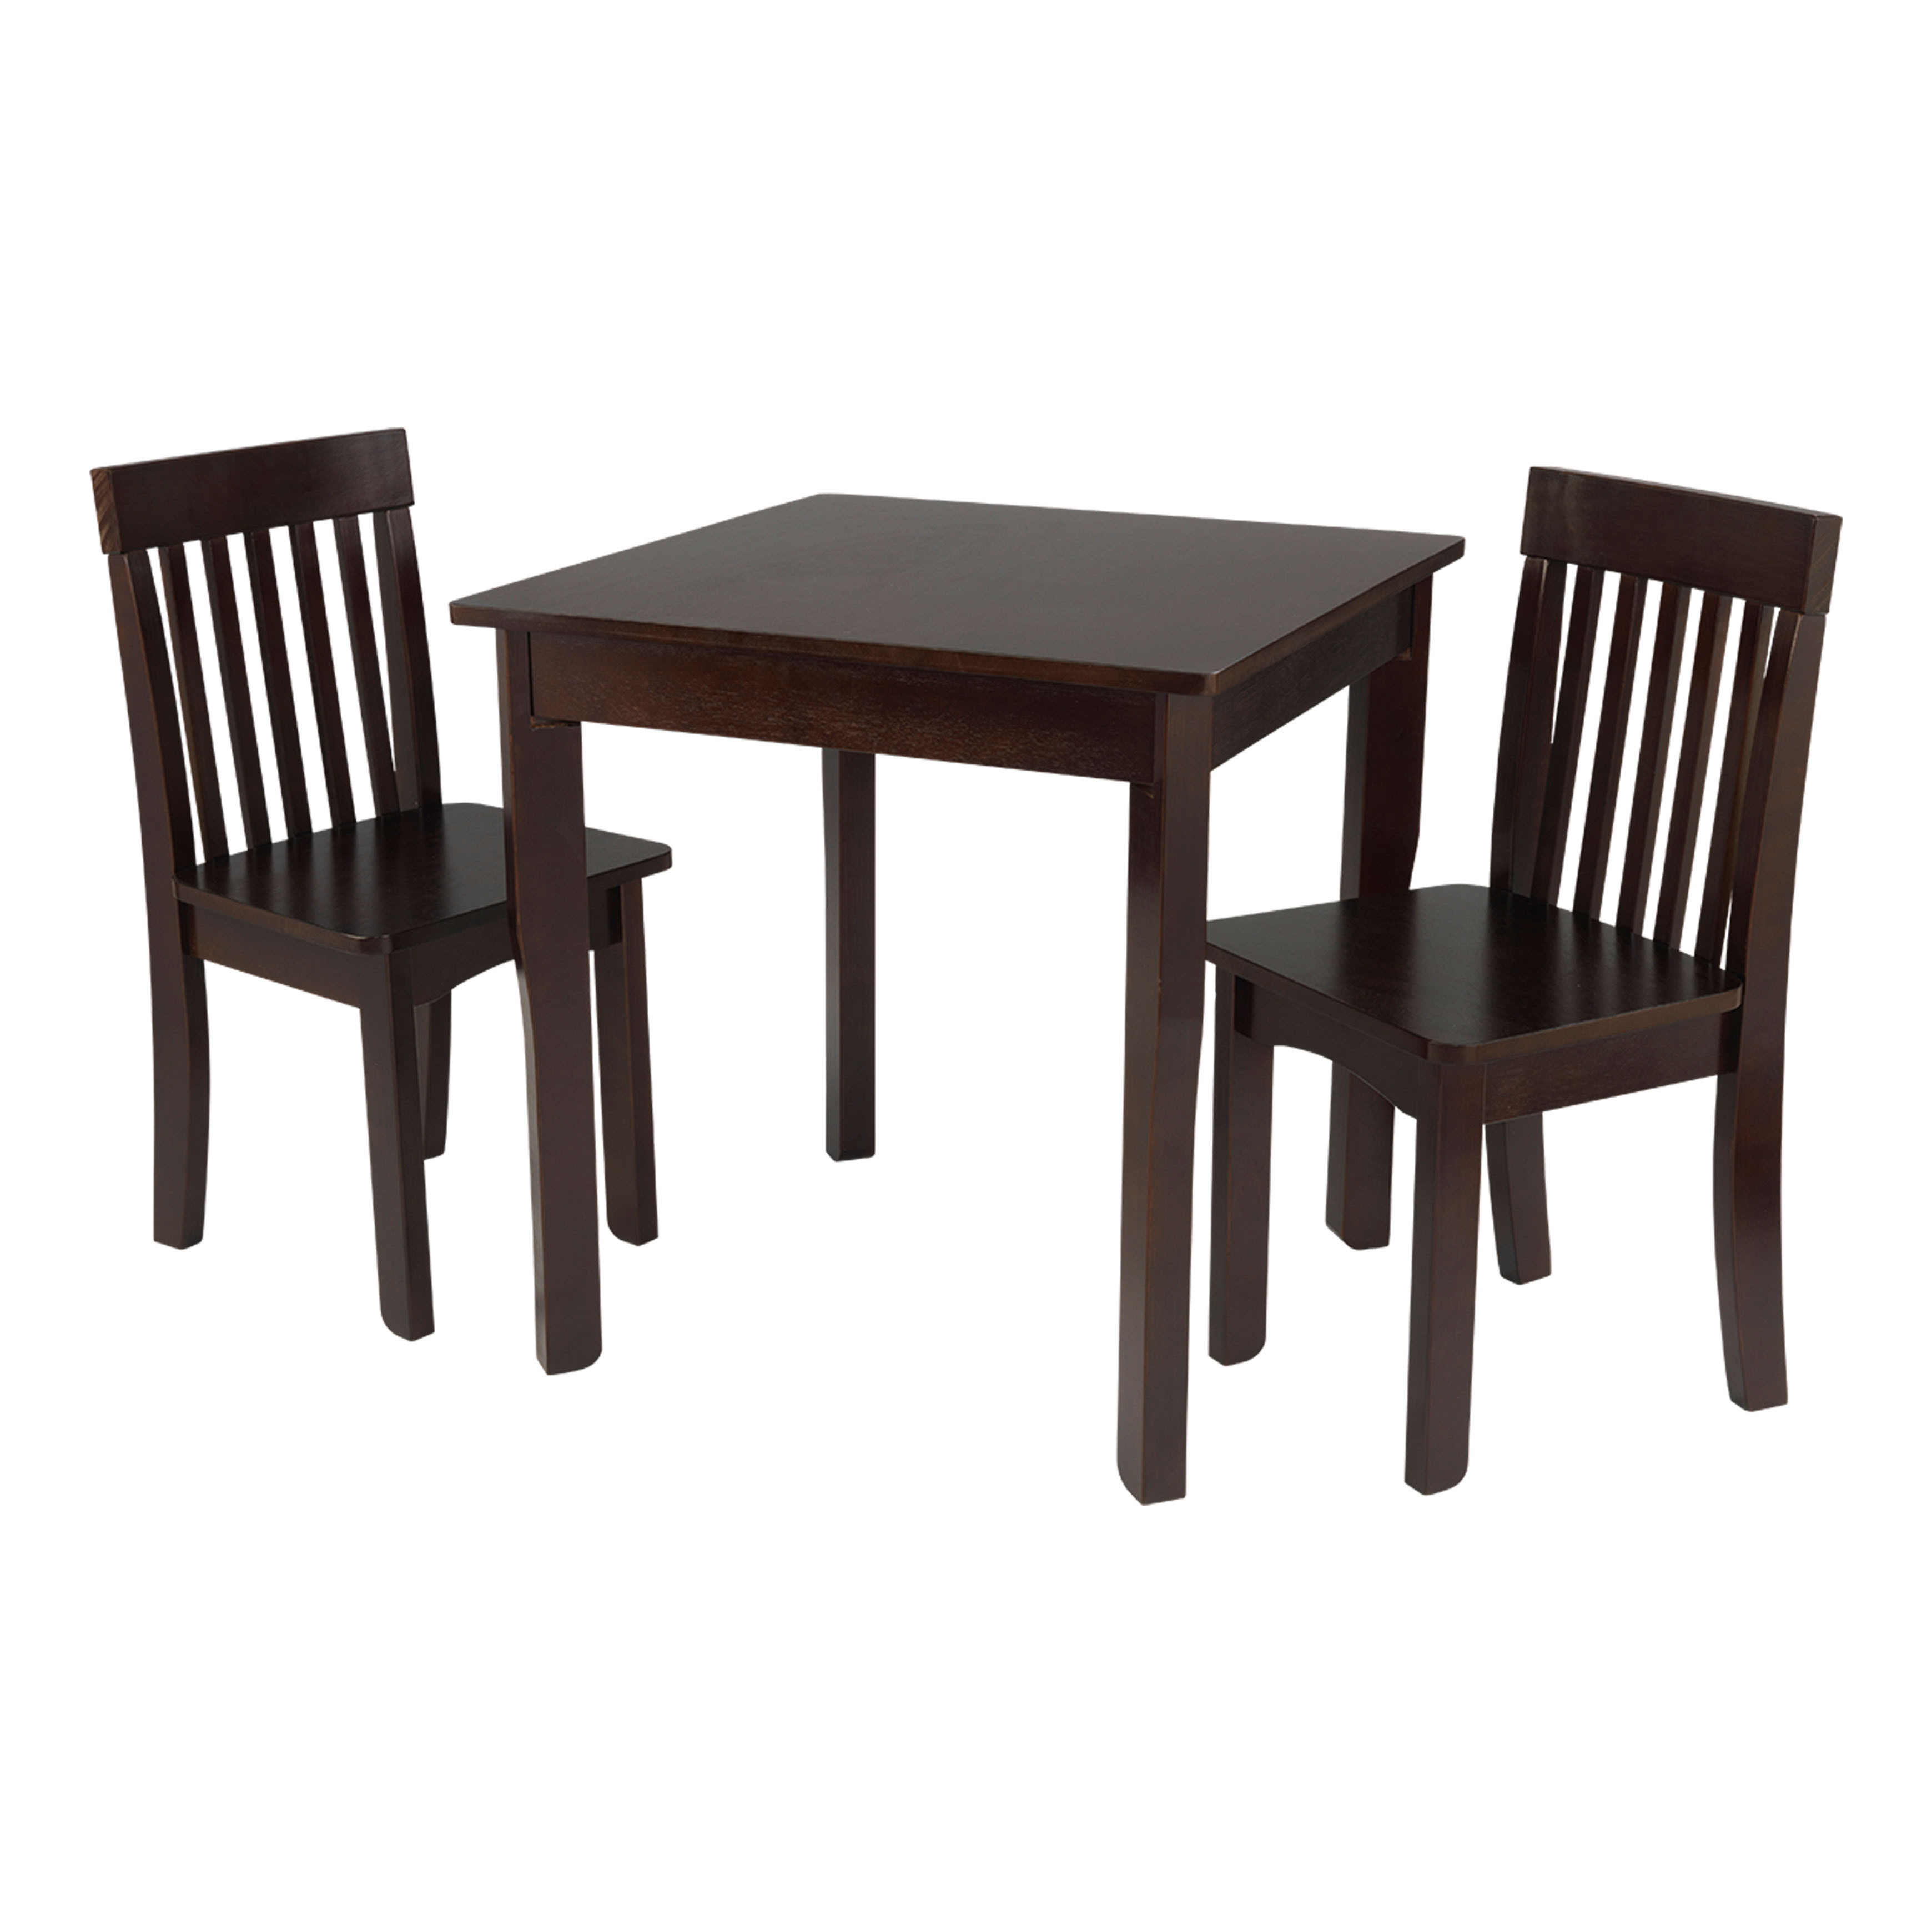 KidKraft Avalon Square Table & 2 Chair Set Espresso by KidKraft, Inc.